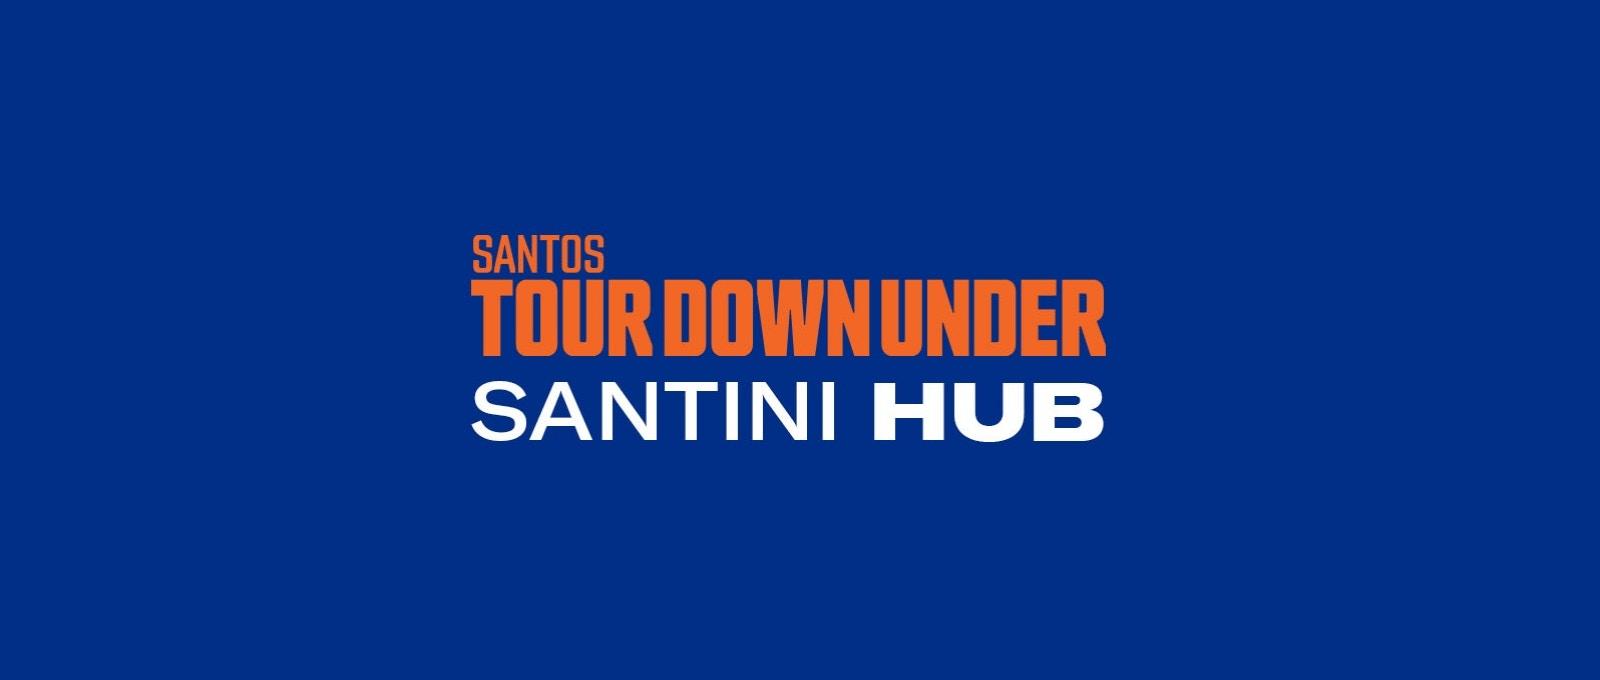 Tour Down Under Santini Hub